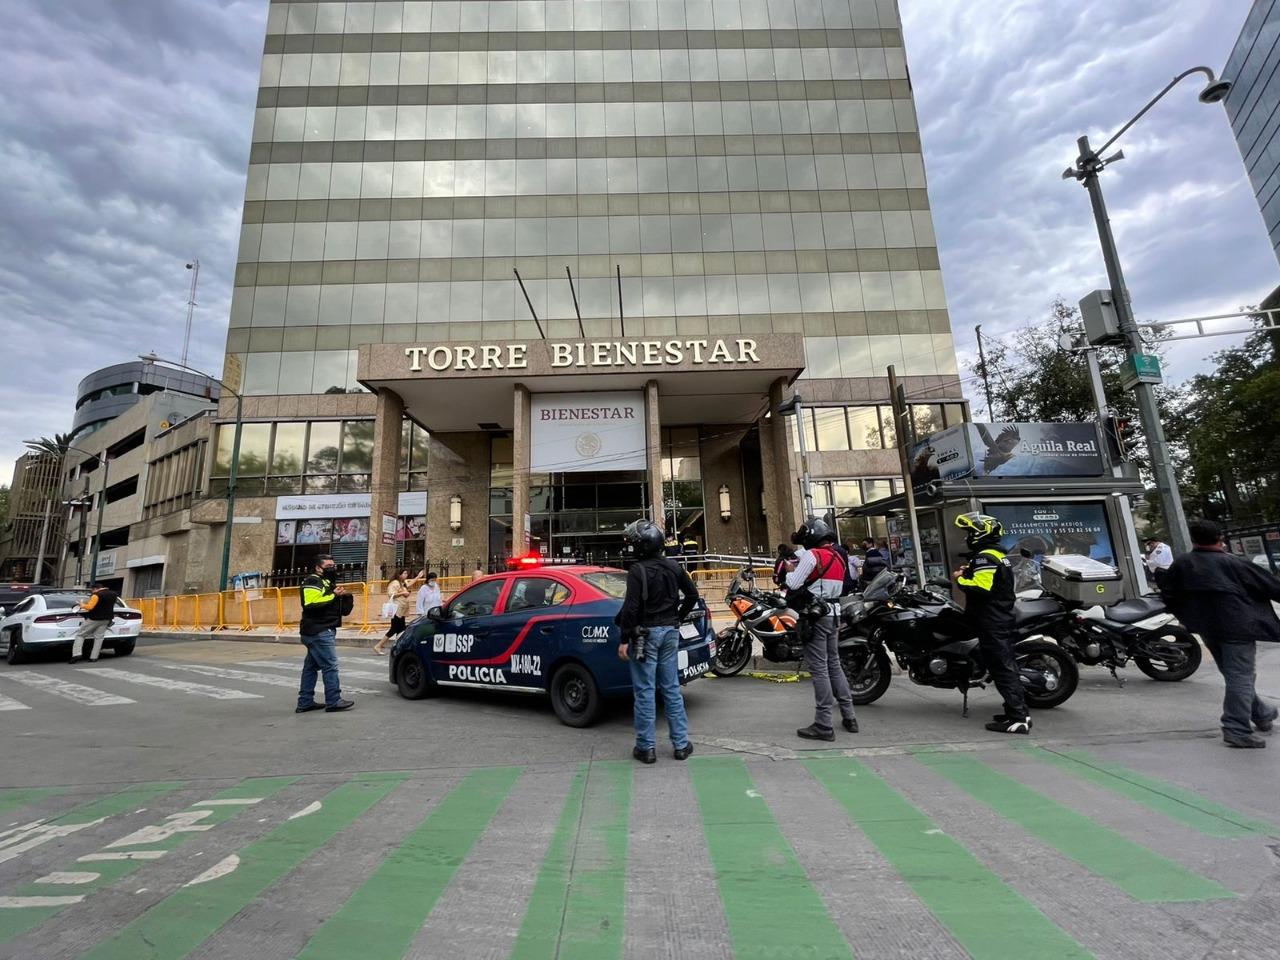 #VIDEO Desalojan Torre Bienestar por amenaza de bomba